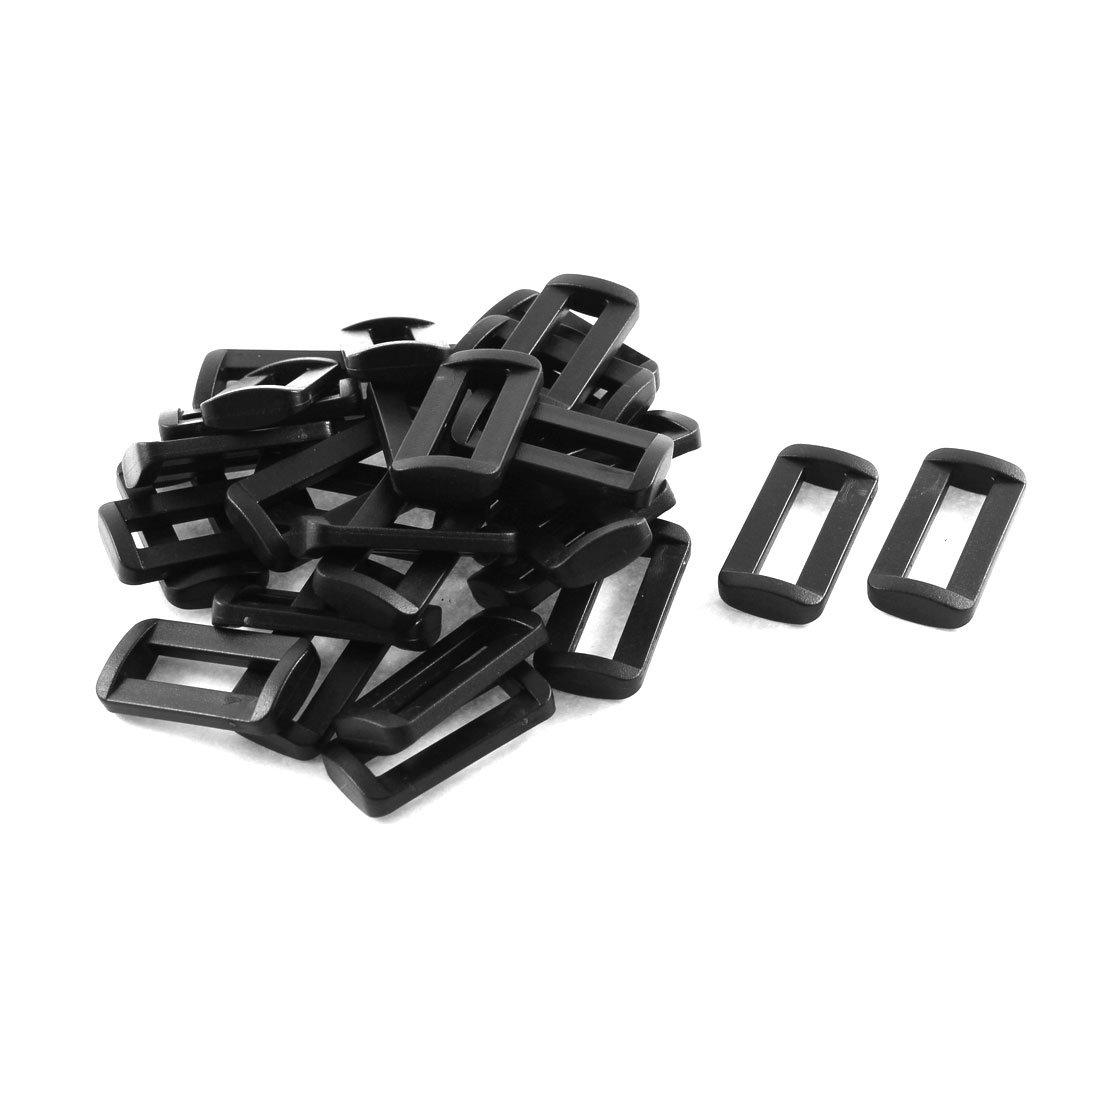 Plastic Bar Slides Buckles 30pcs Black for 25mm Webbing Strap uxcell a15050400ux0036